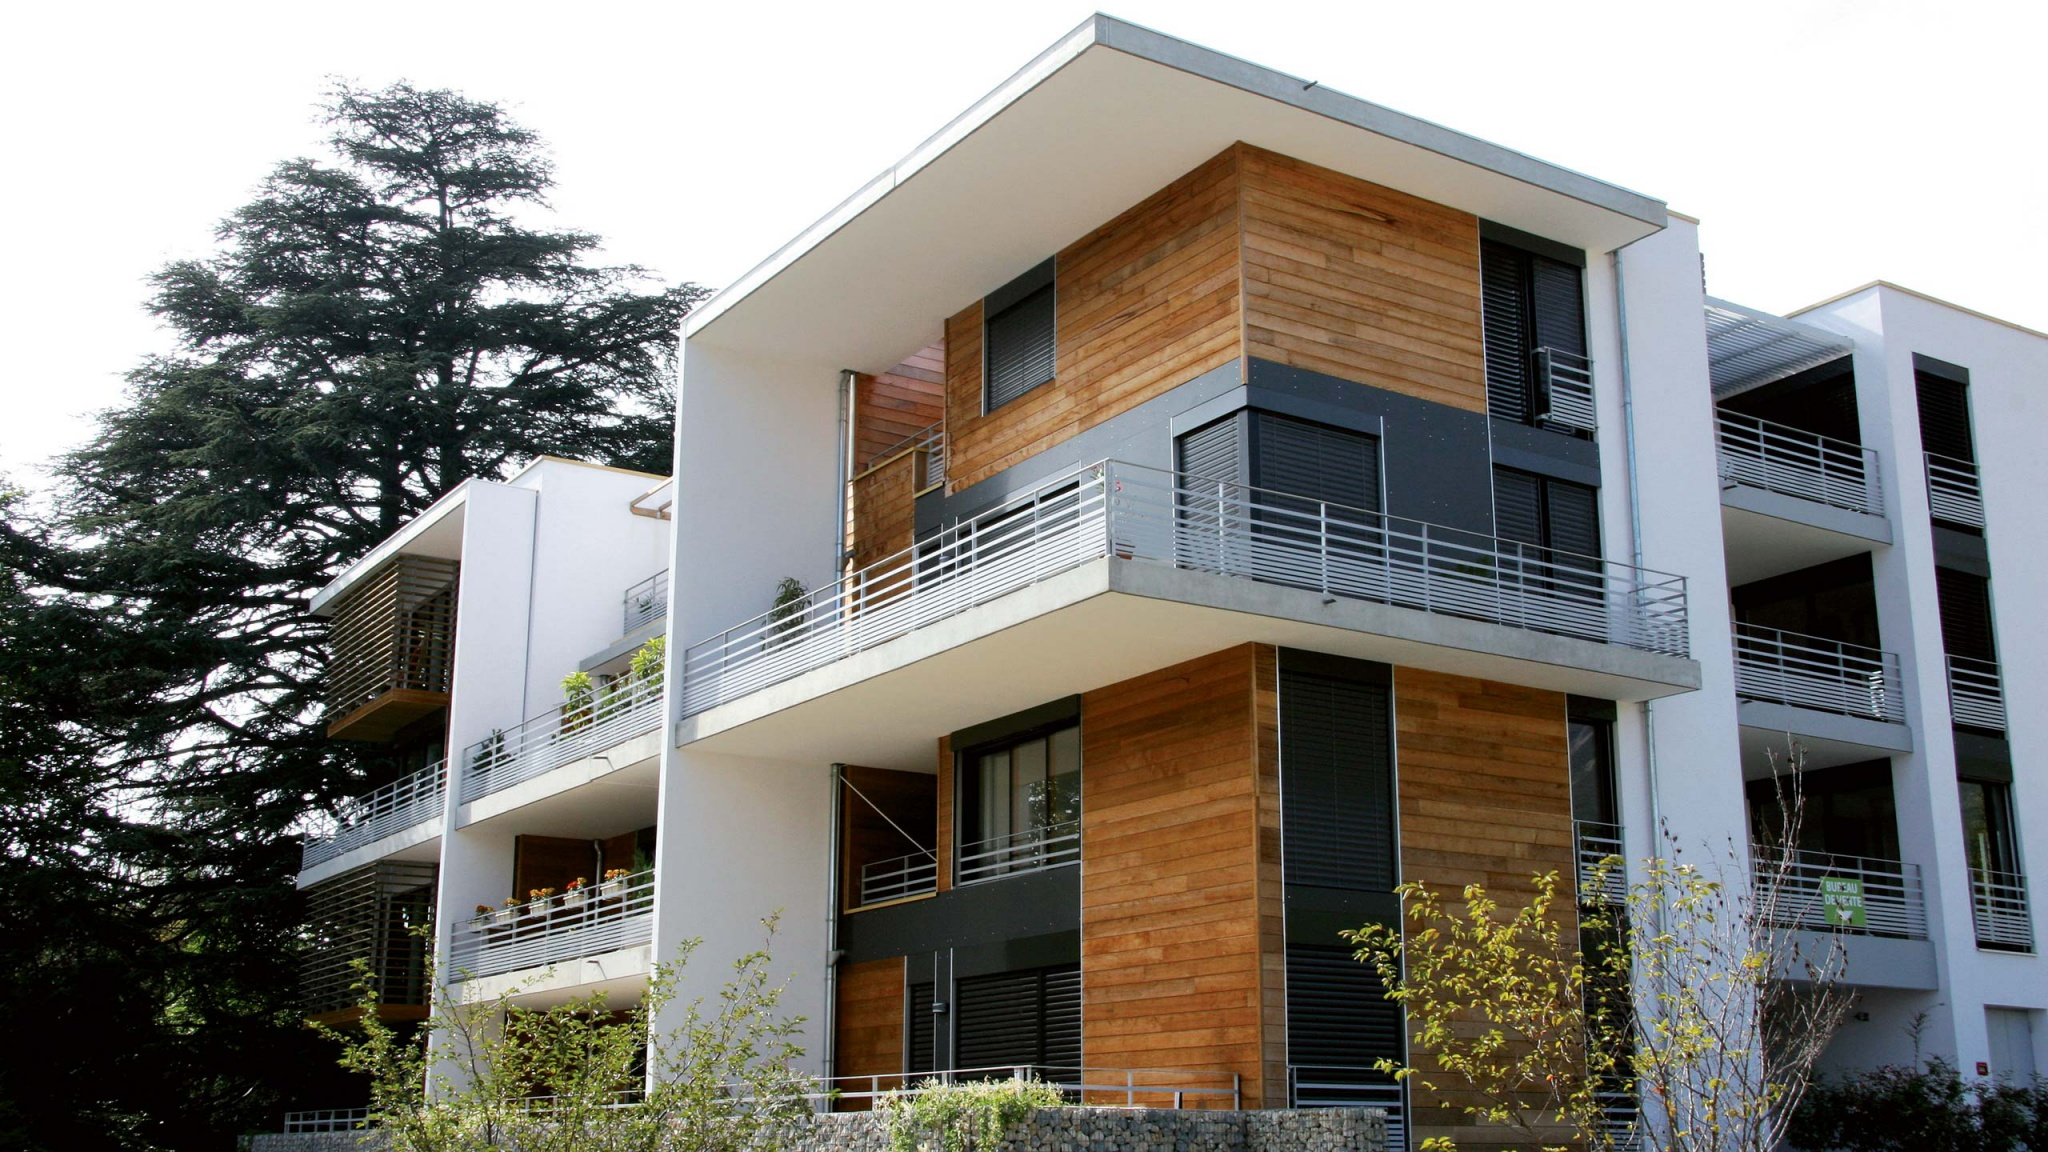 Projet immobilier à Meylan